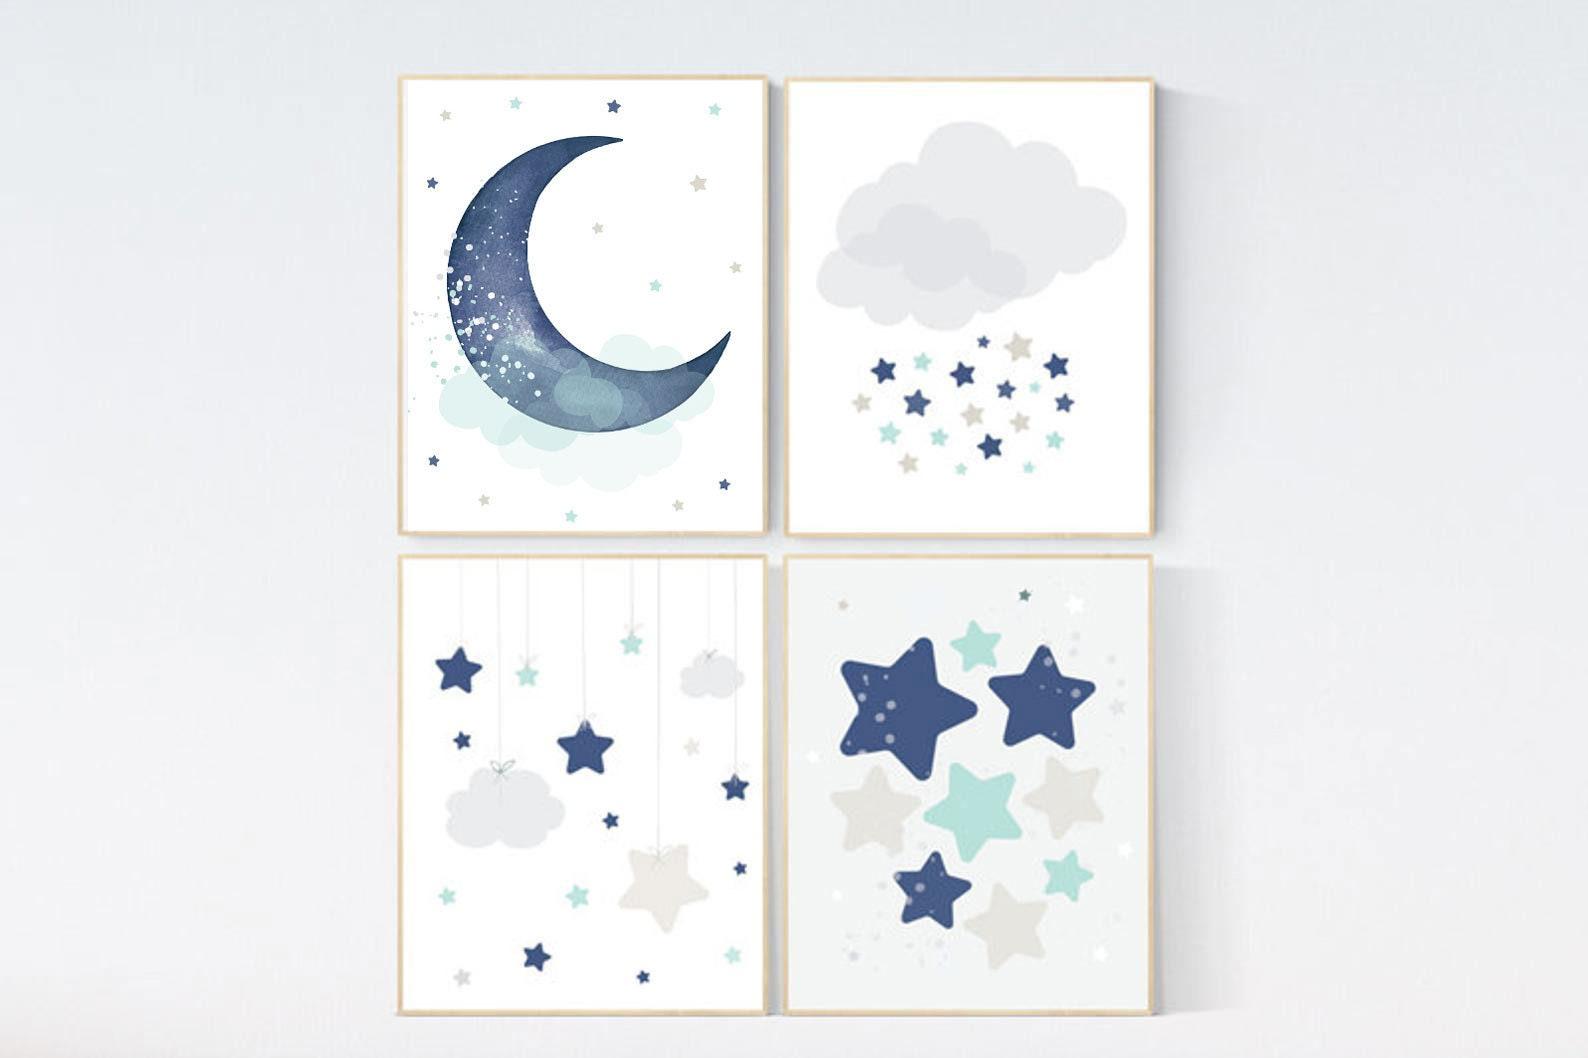 Baby Boy Nursery Decor Navy Teal Gray Nursery Boys Room Wall Art Baby Room Prints Moon And Star Nursery